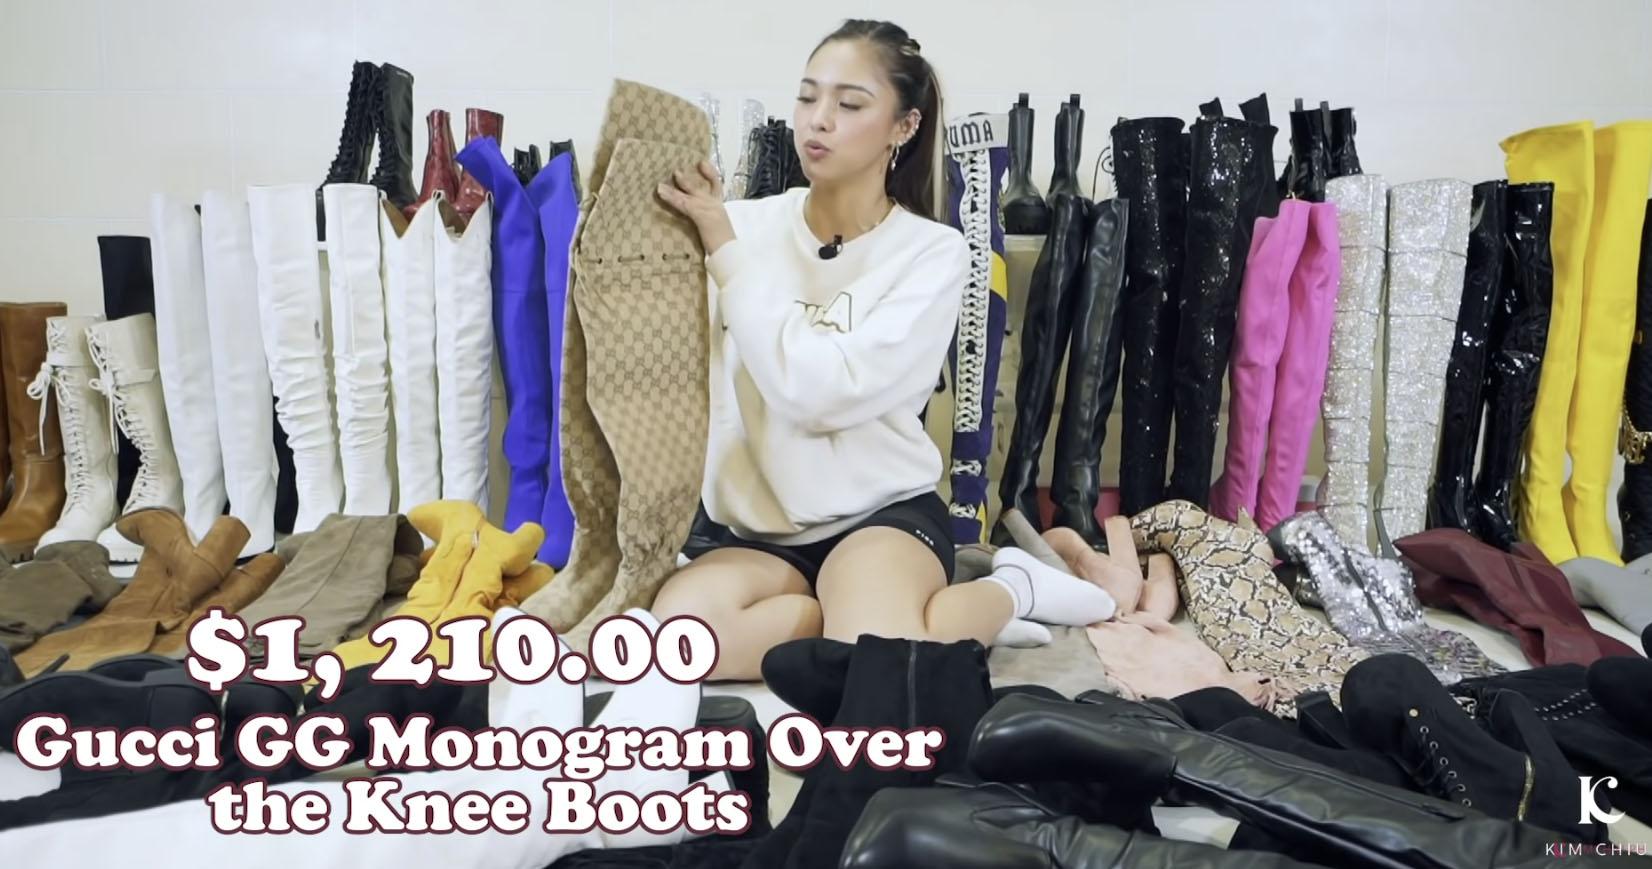 Youtube Vlog Screengrab: Kim Chiu Gucci GG Monogram over-the-knee boots